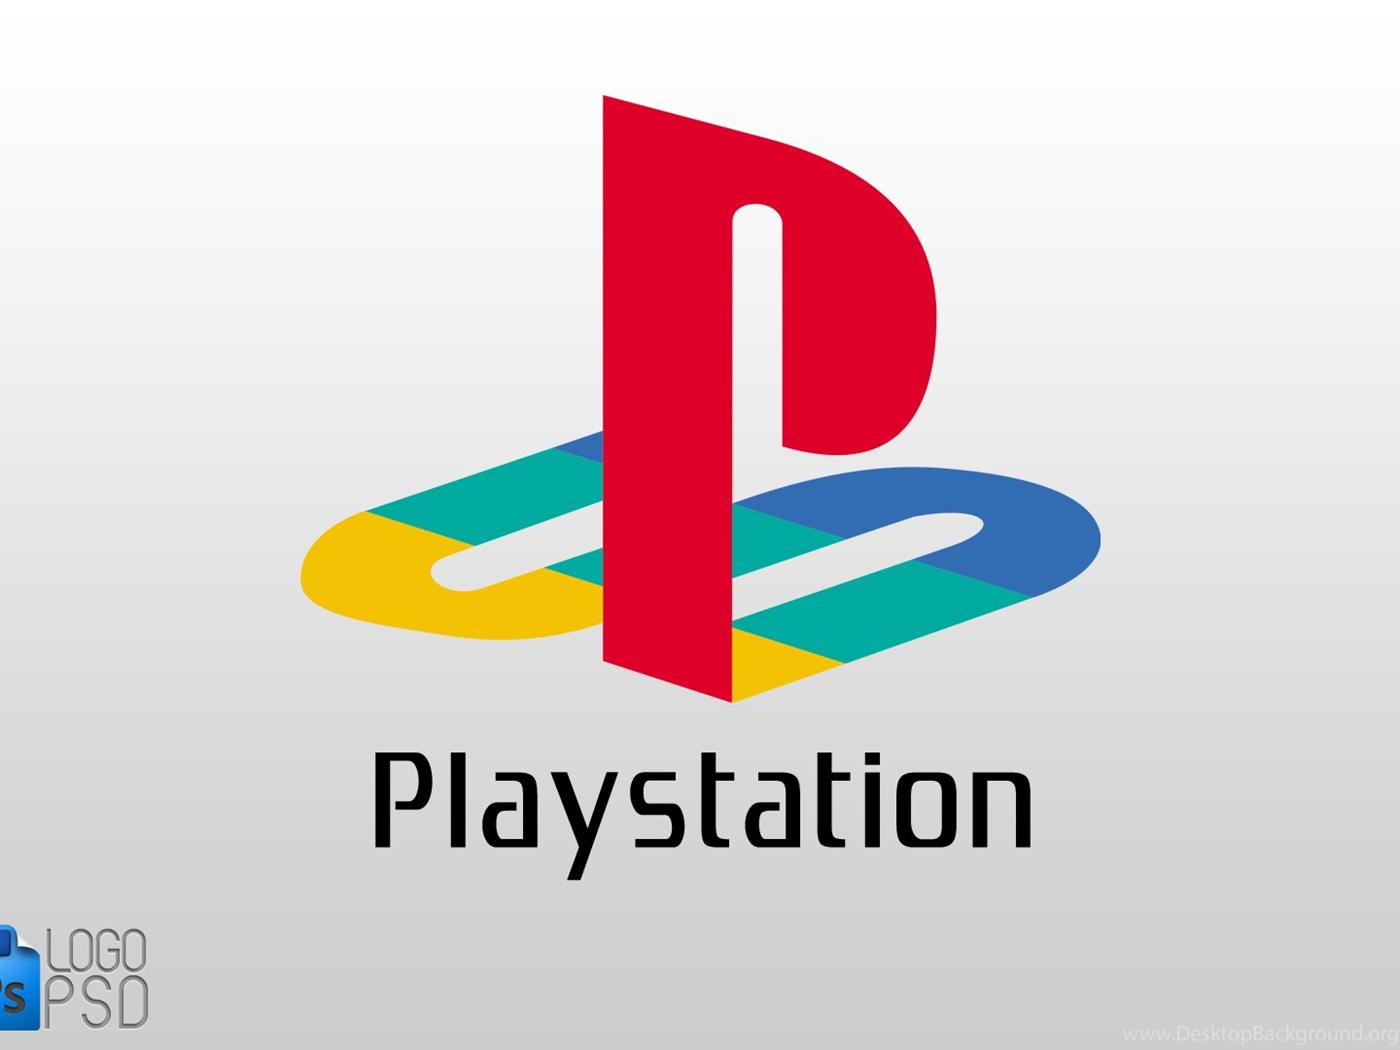 Playstation 2 Logo Wallpaper Desktop Background